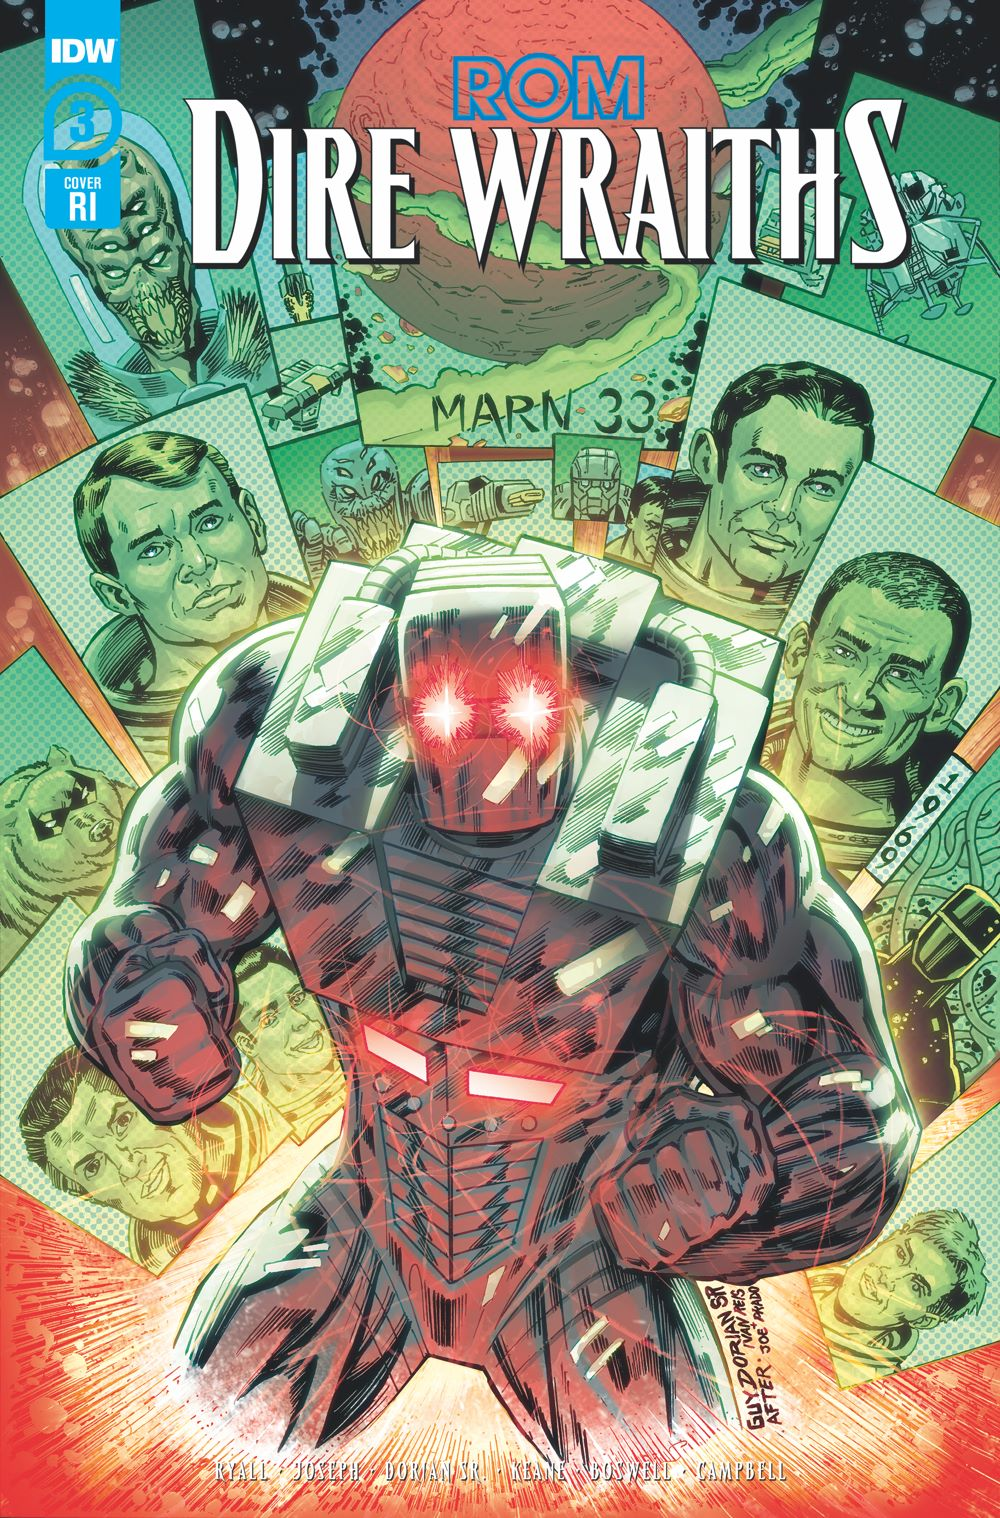 Rom-DW03_cvrRI ComicList Previews: ROM DIRE WRAITHS #3 (OF 3)